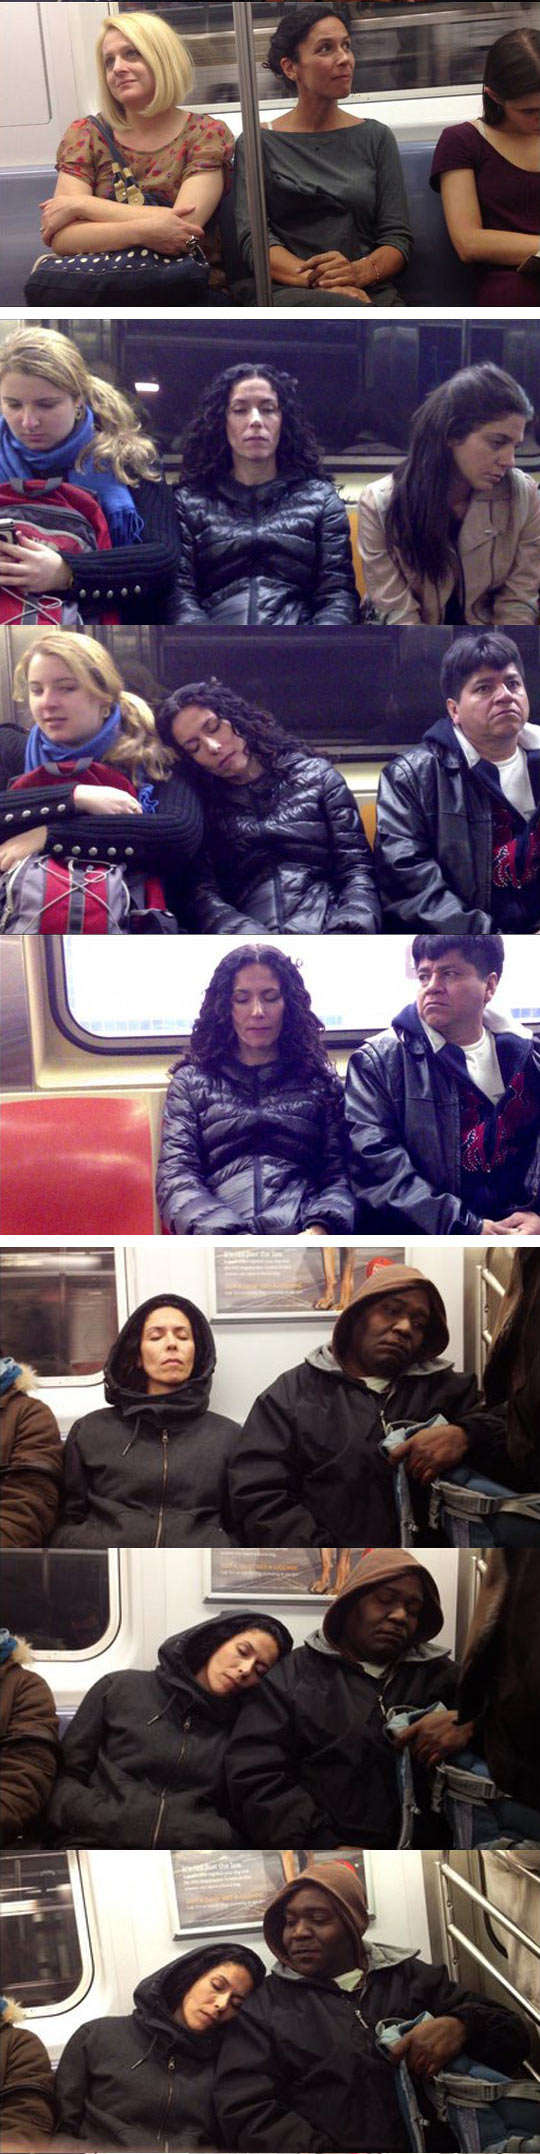 funny-artist-reaction-strangers-sleep